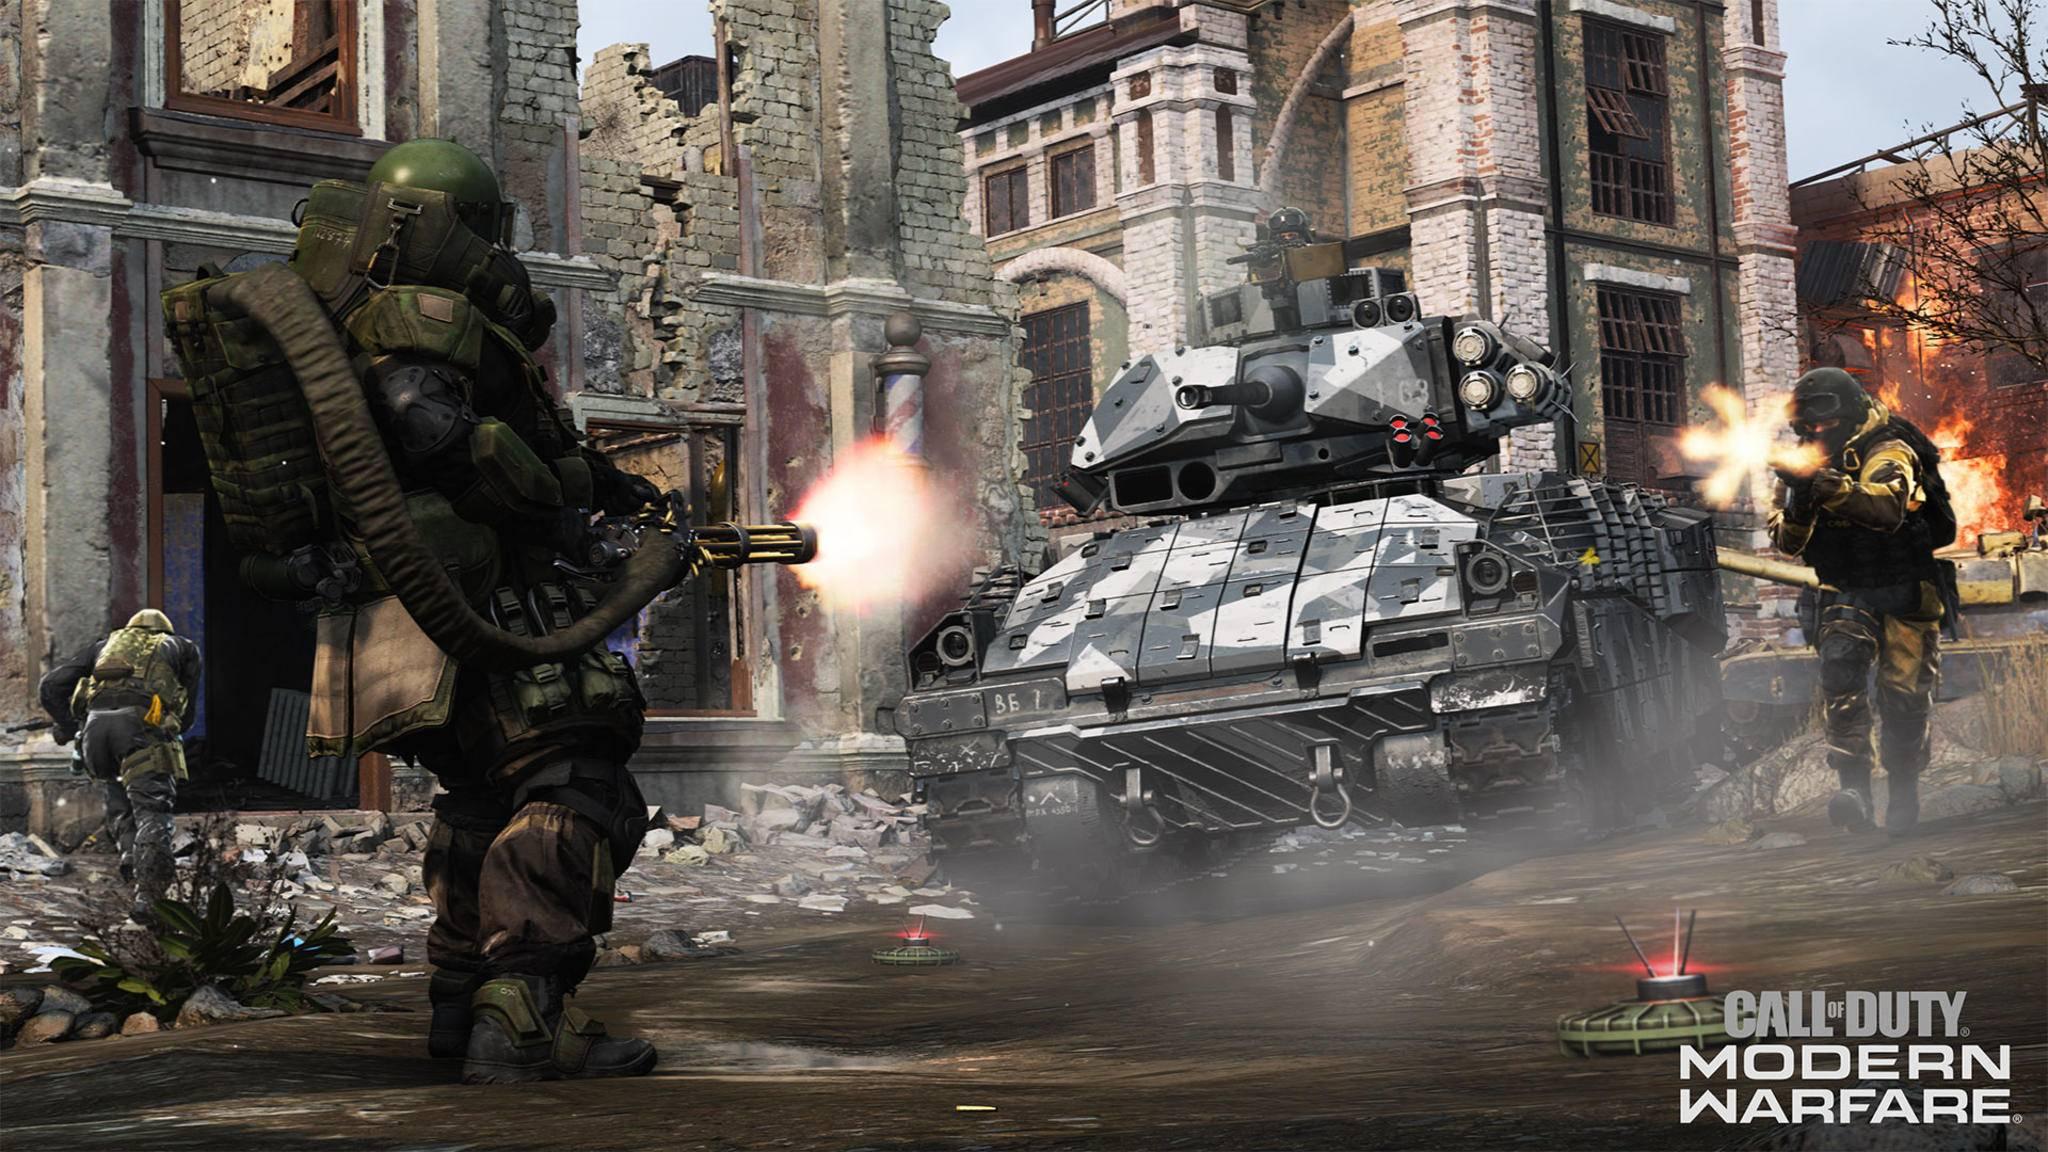 call-of-duty-modern-warfare-multiplayer-screenshot-04